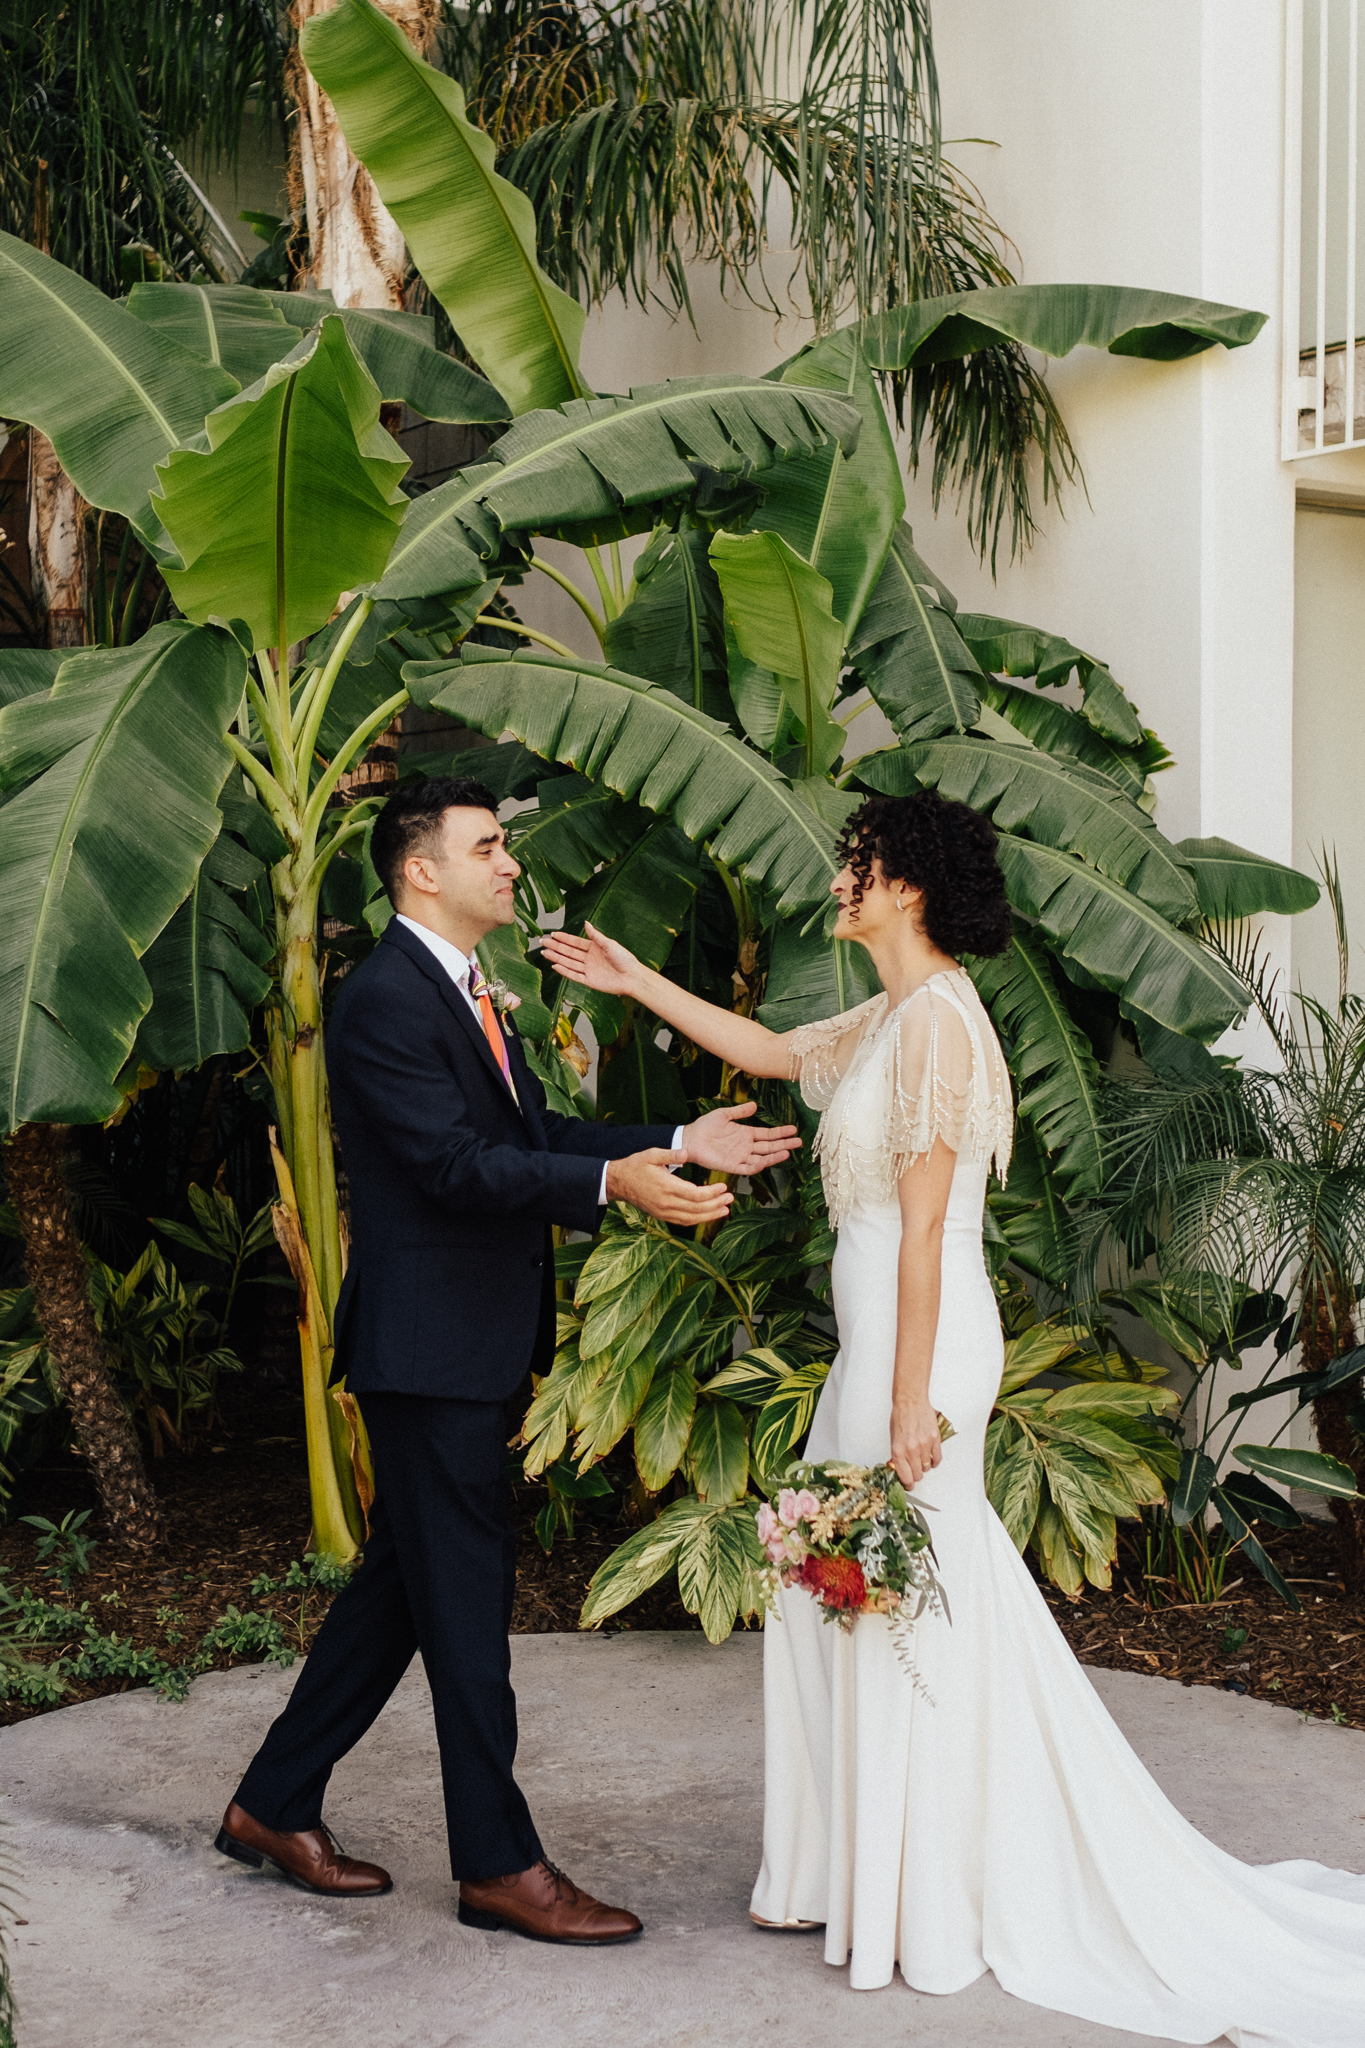 Arizona-Adventure-Elopement-Wedding-Photographer-151.jpg